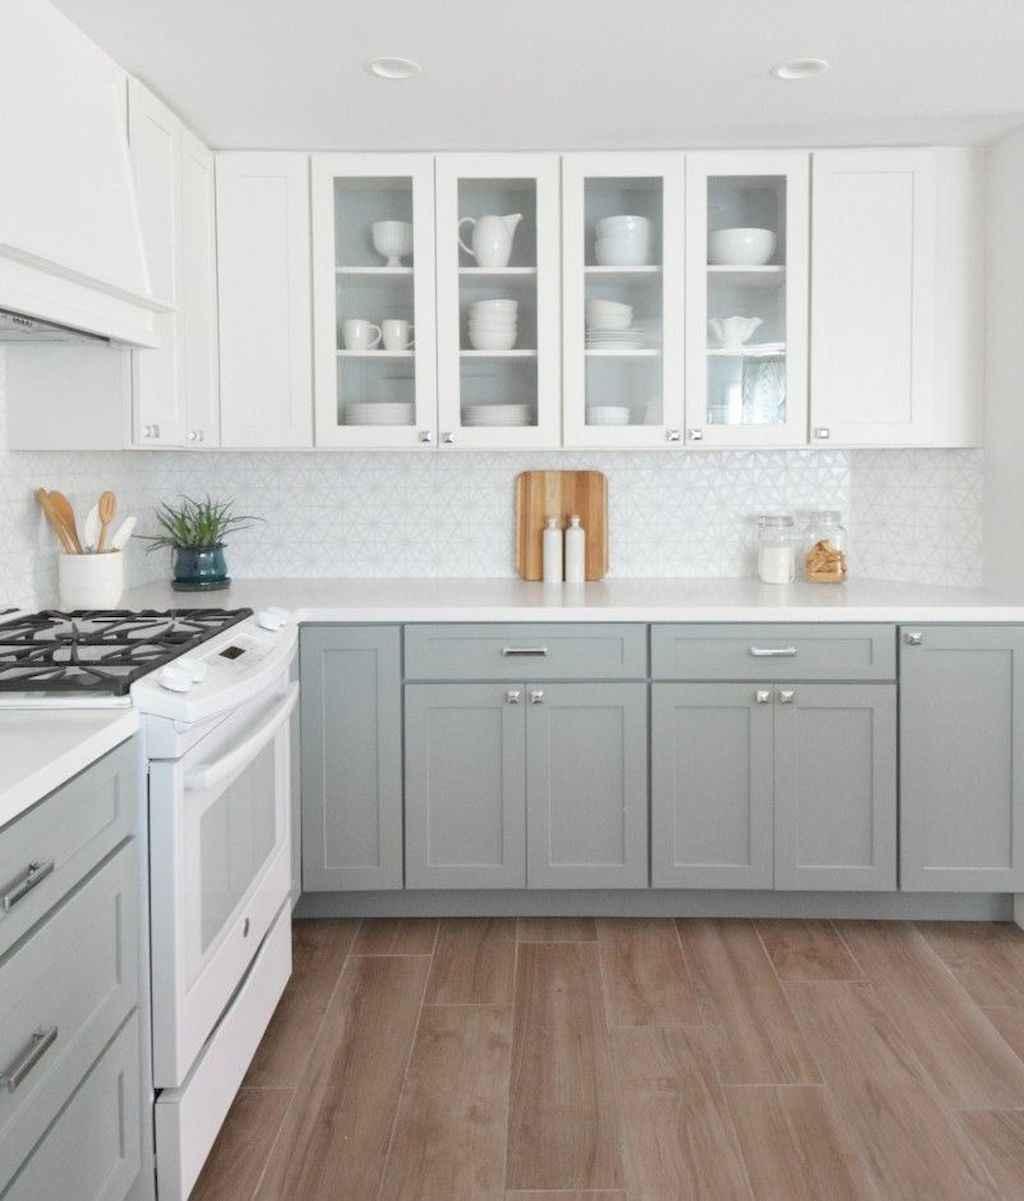 Gorgeous gray kitchen cabinet makeover ideas (33)